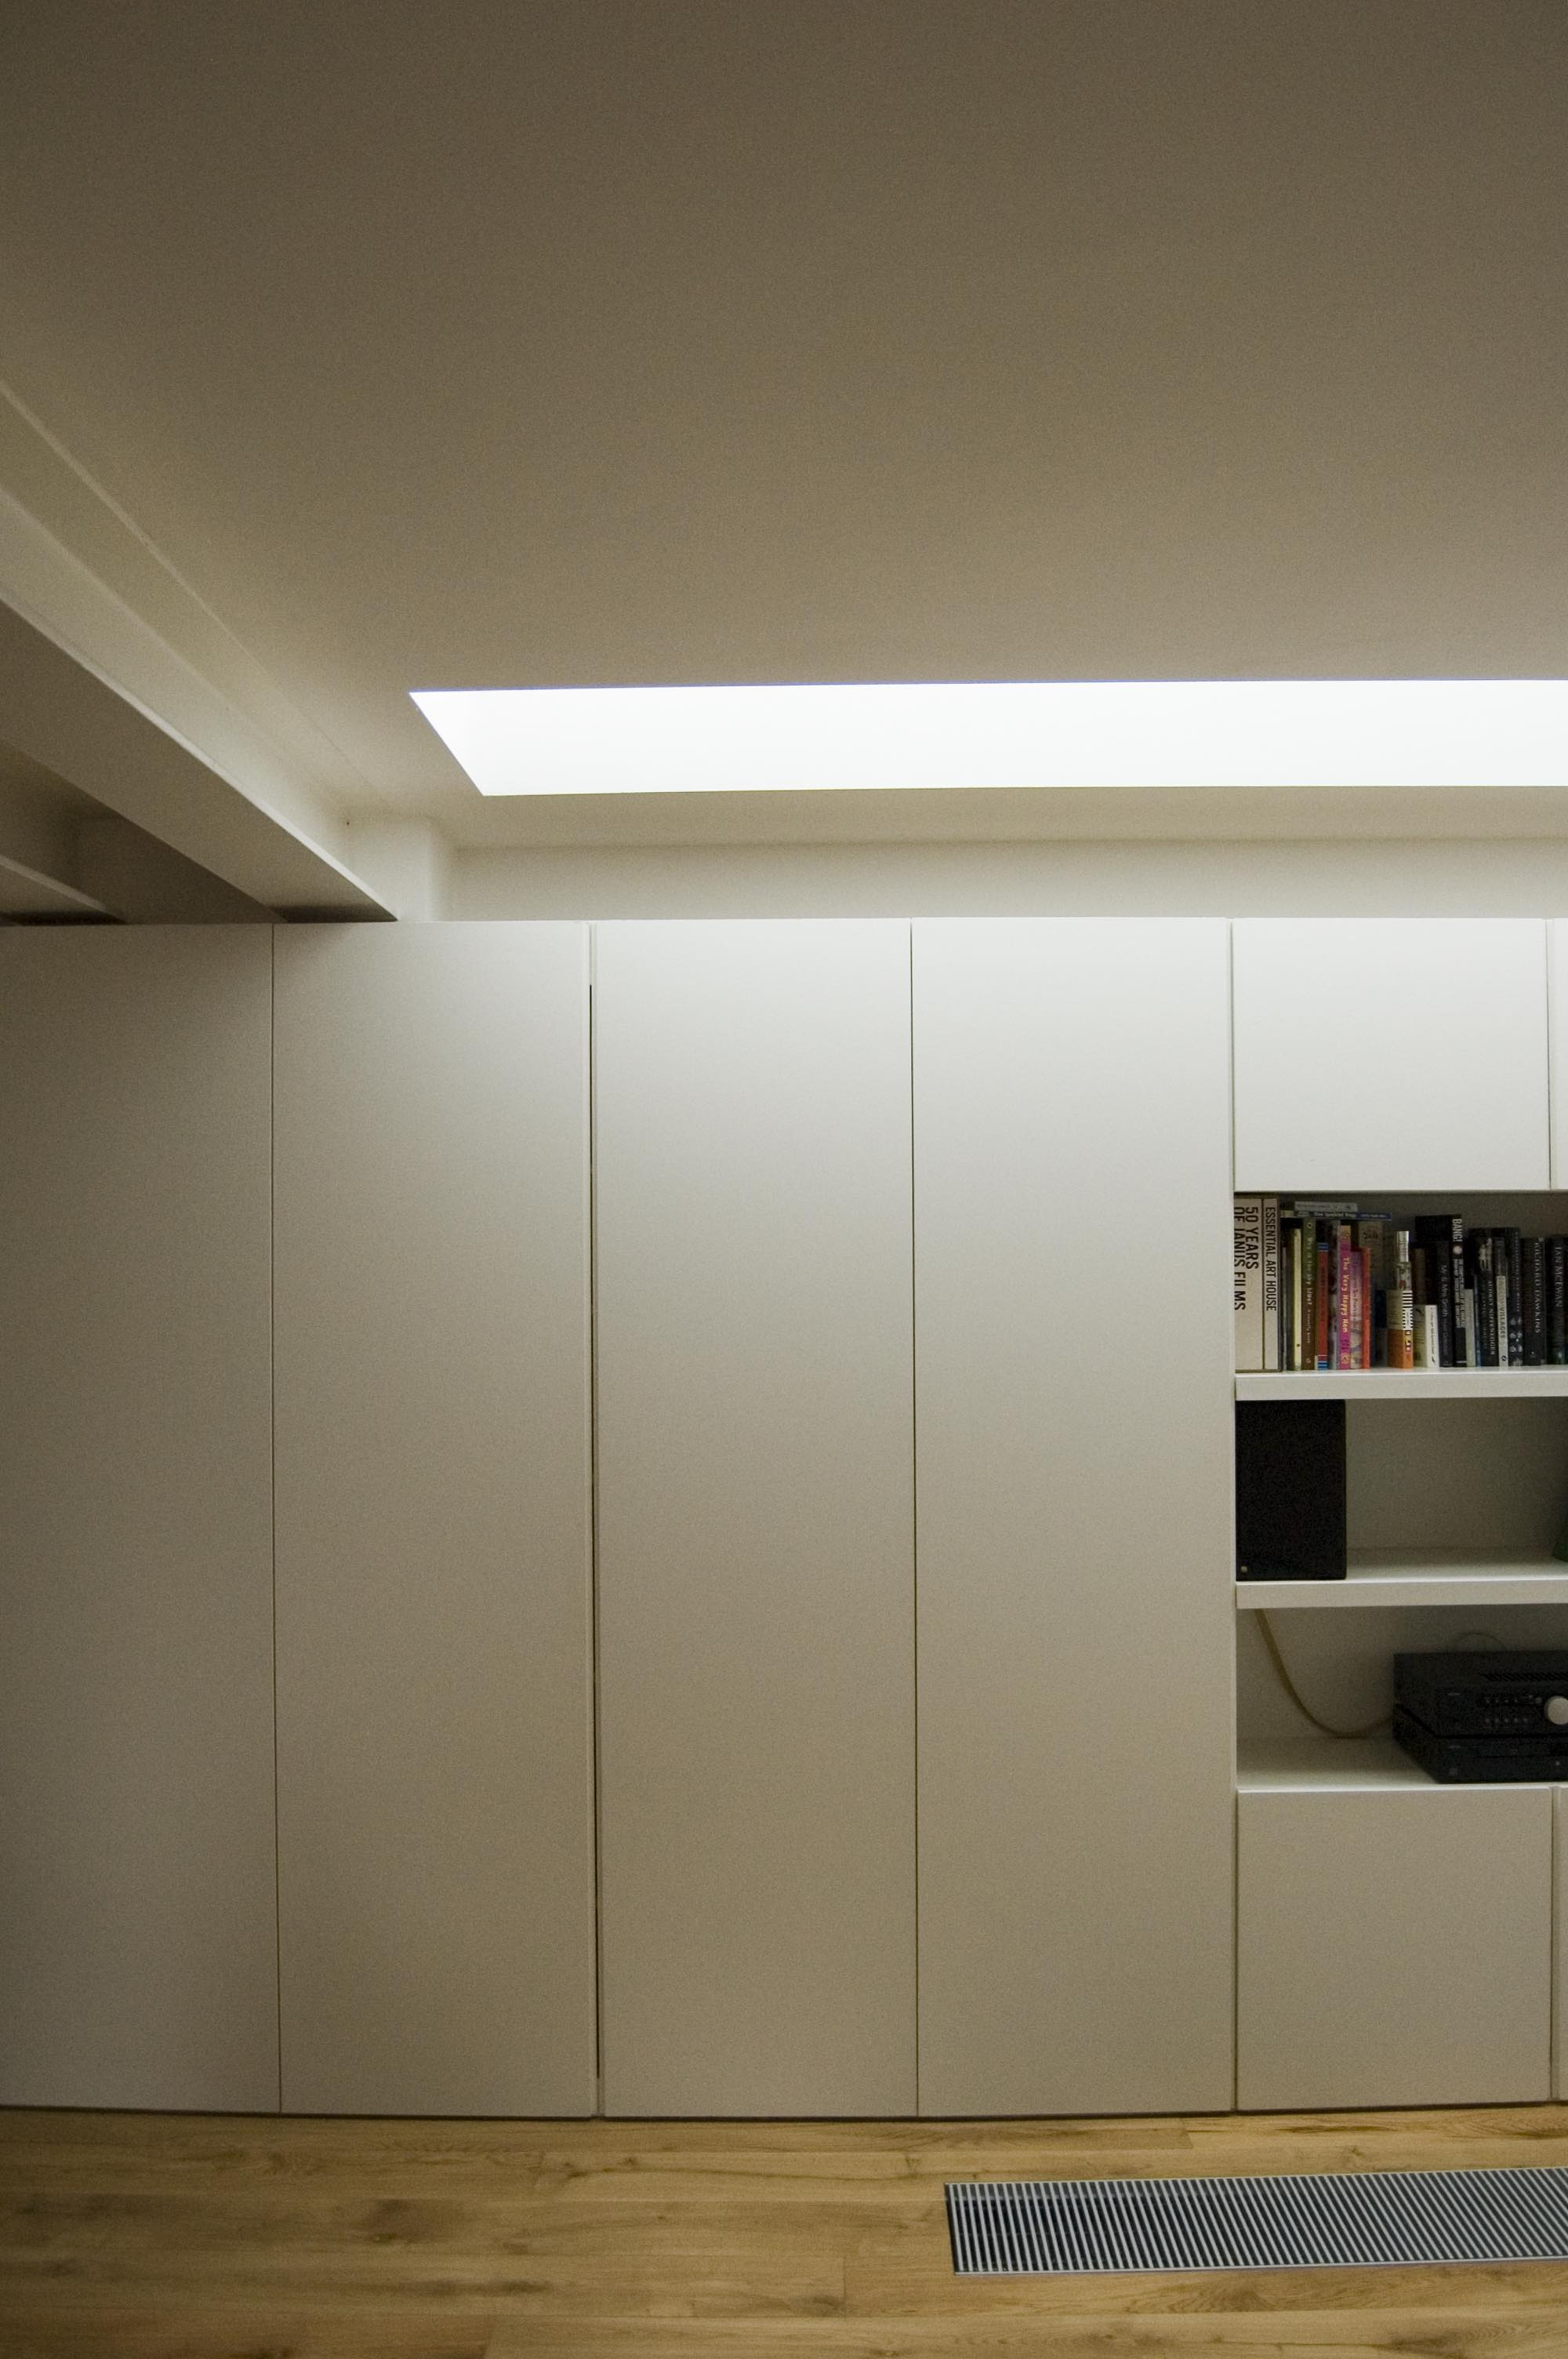 WTAD_rooflight & joinery.jpg